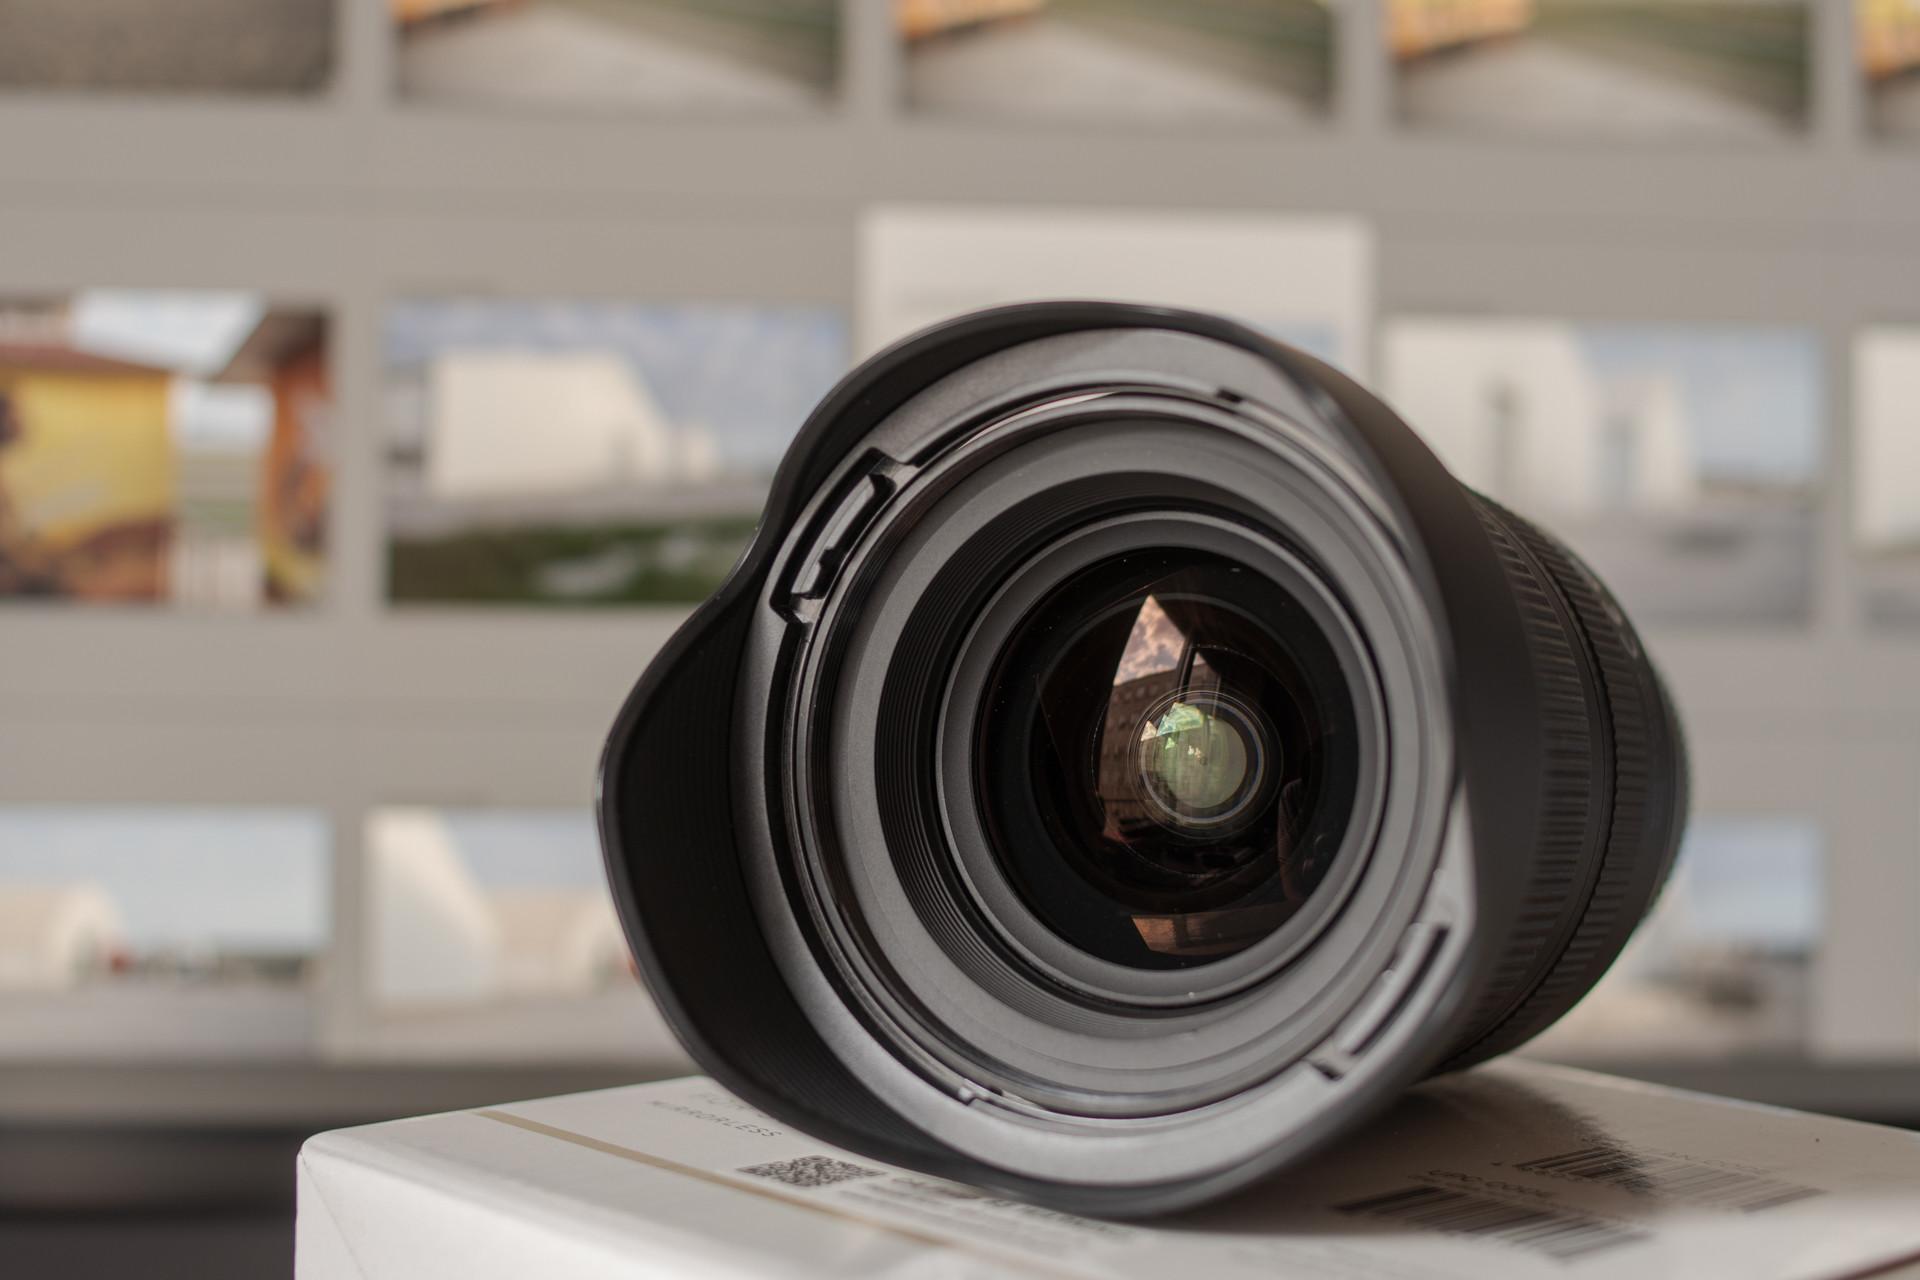 Foto de Fotografías del Tamron 17-28mm F/2.8 Di III RXD (3/17)